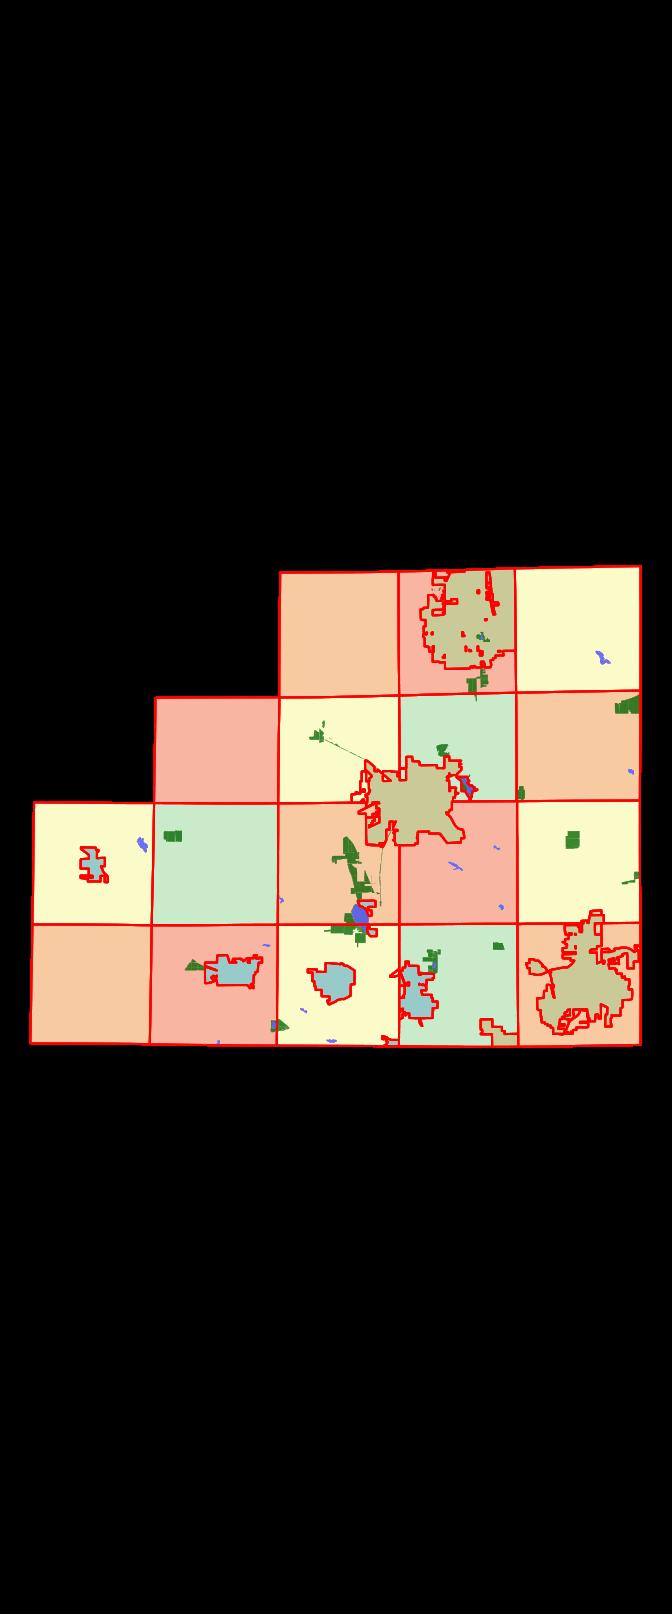 MC-GIS York County Tax Map on county road maps, county farm maps, county services maps, county health maps, county parcel maps, county subdivisions,